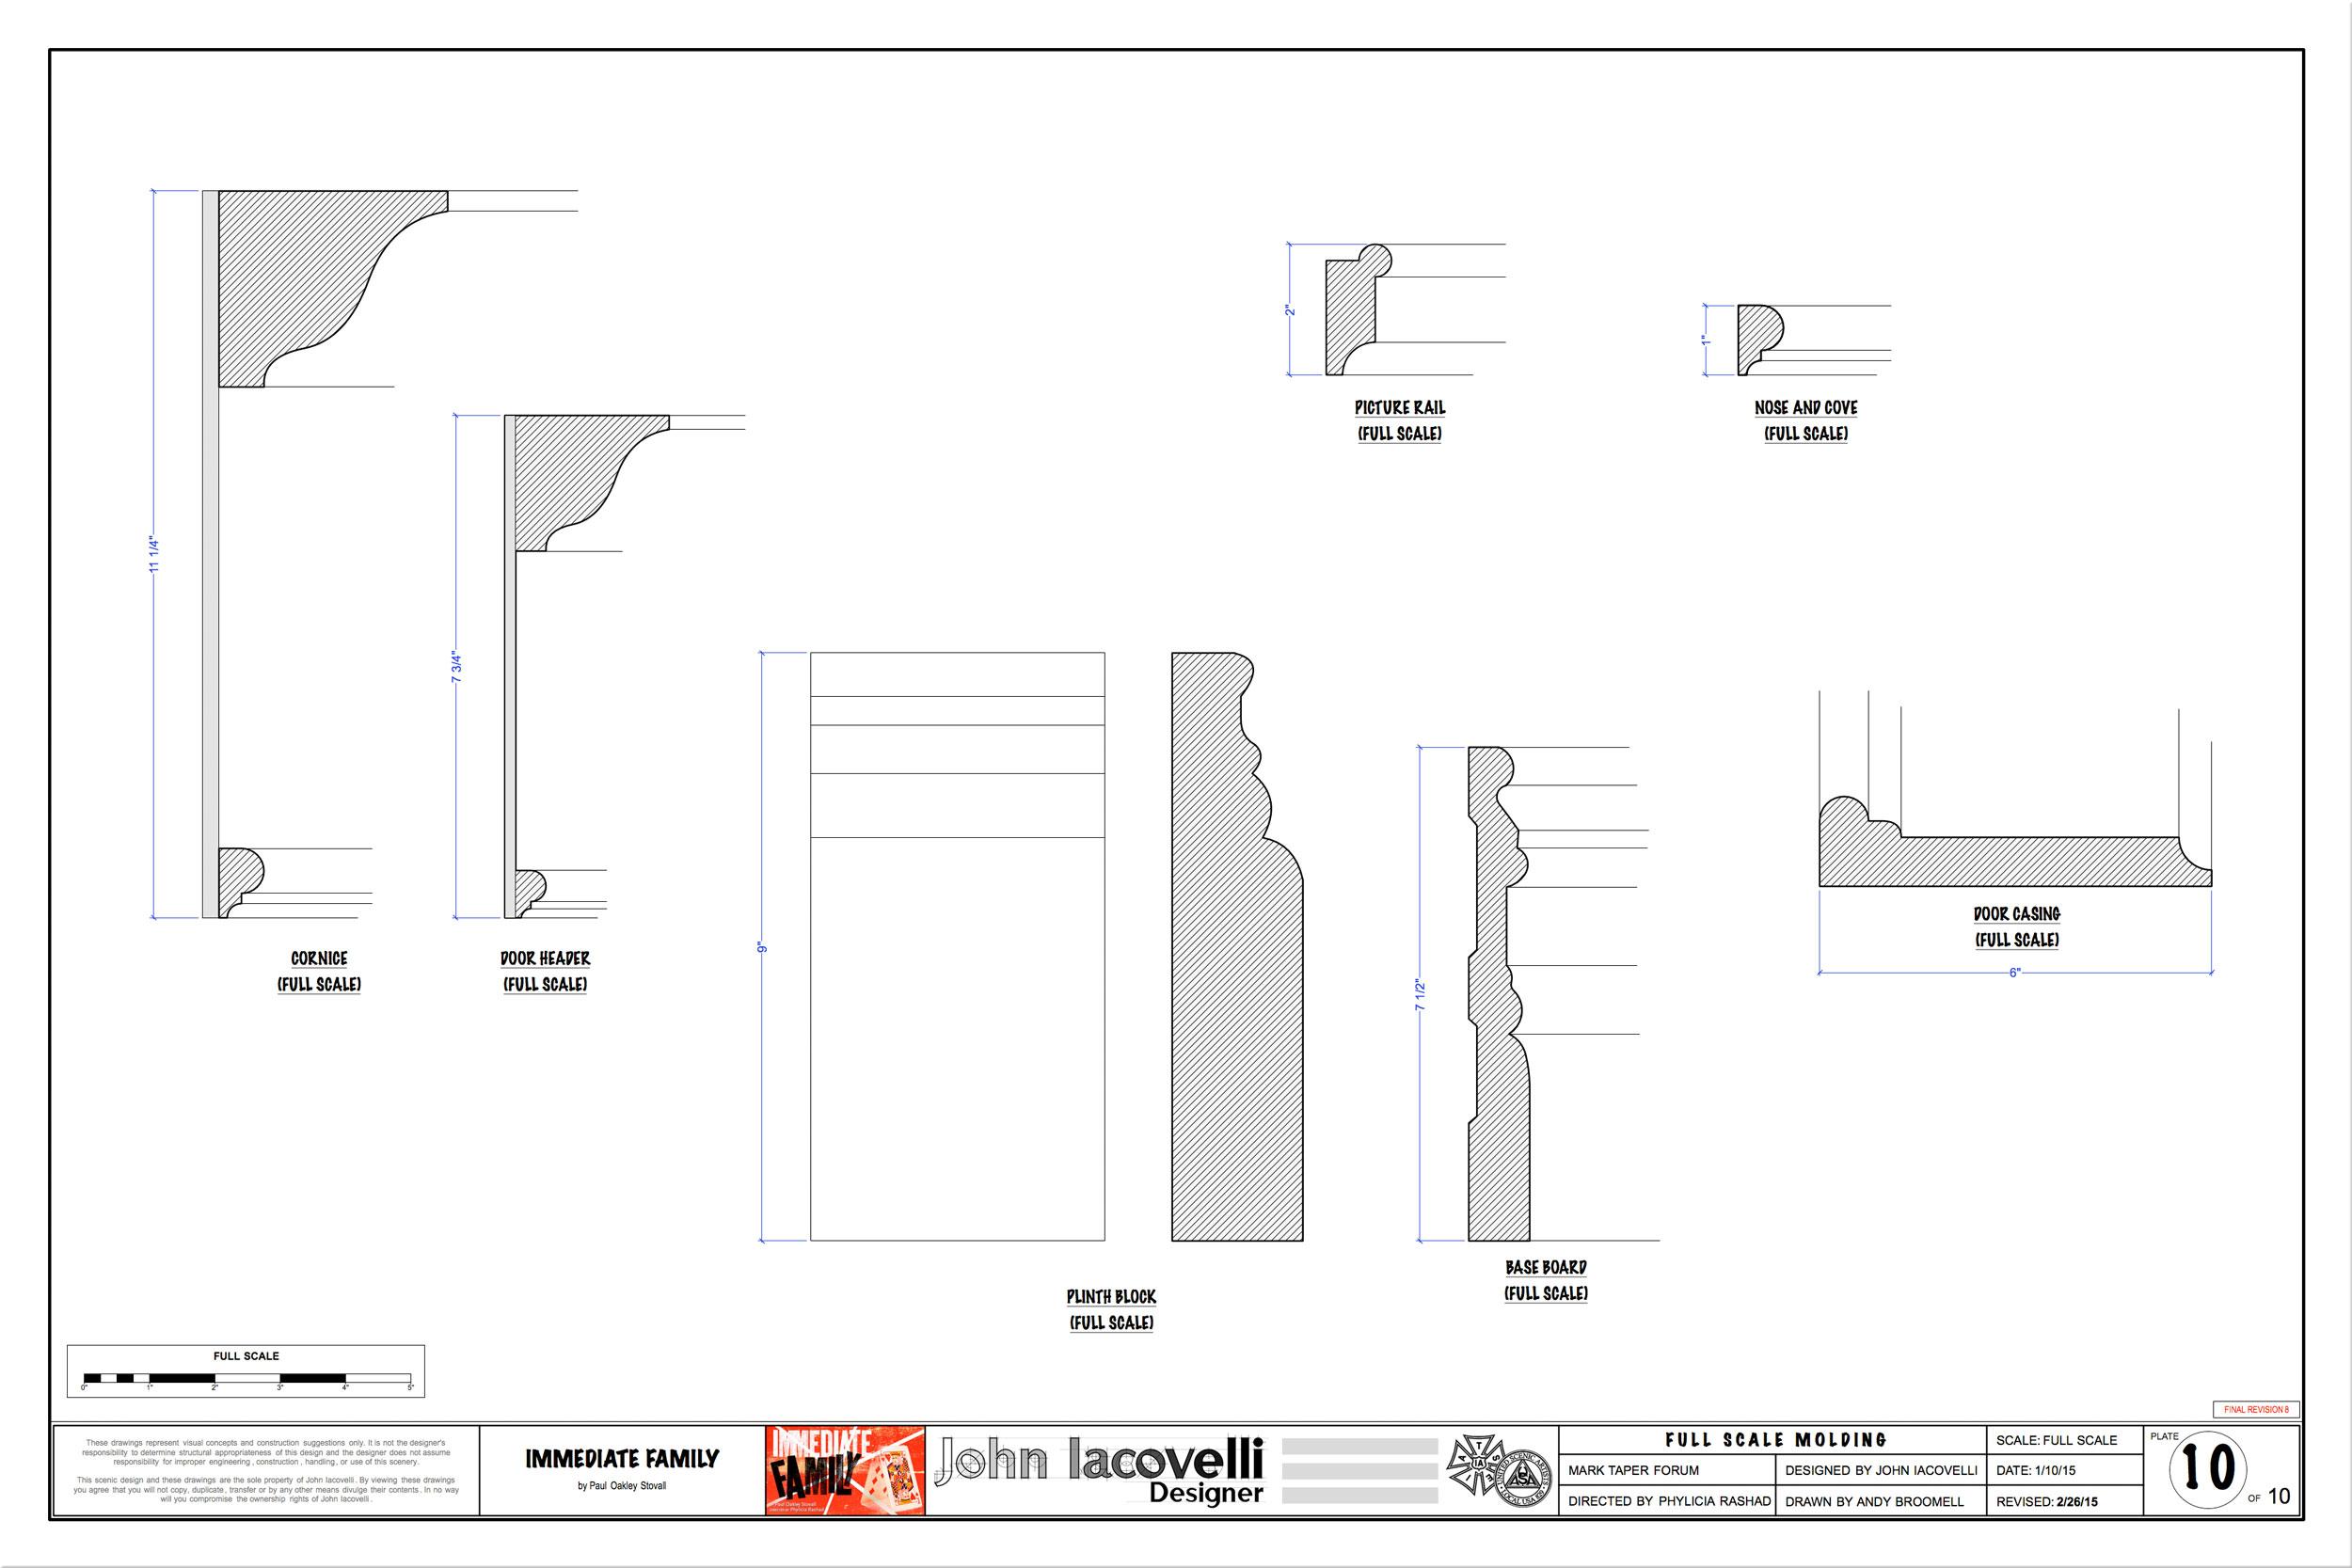 andy-broomell-scenic-design-drafting-immediate-family-10-vectorworks.jpg